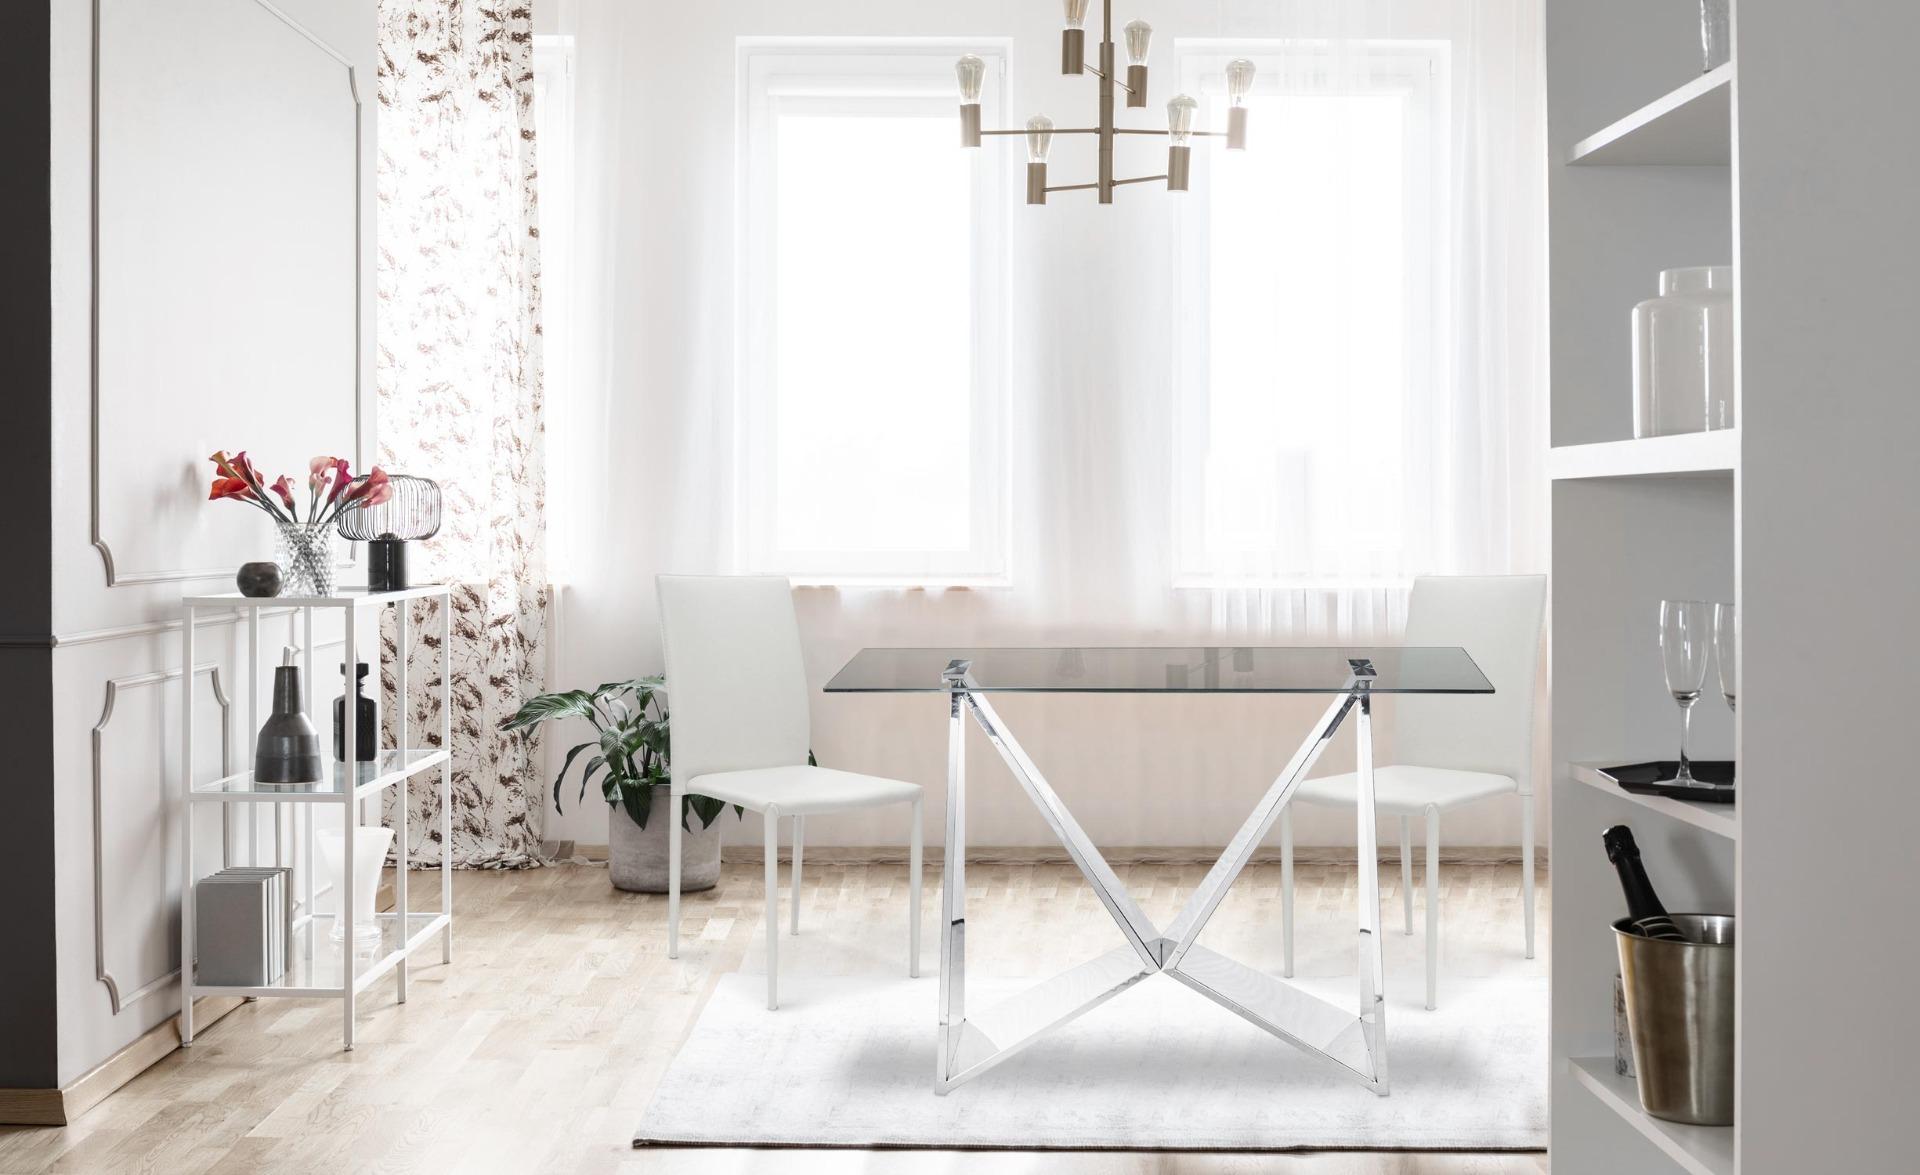 Set di 30 sedie impilabili Modan in similpelle (PU) bianche